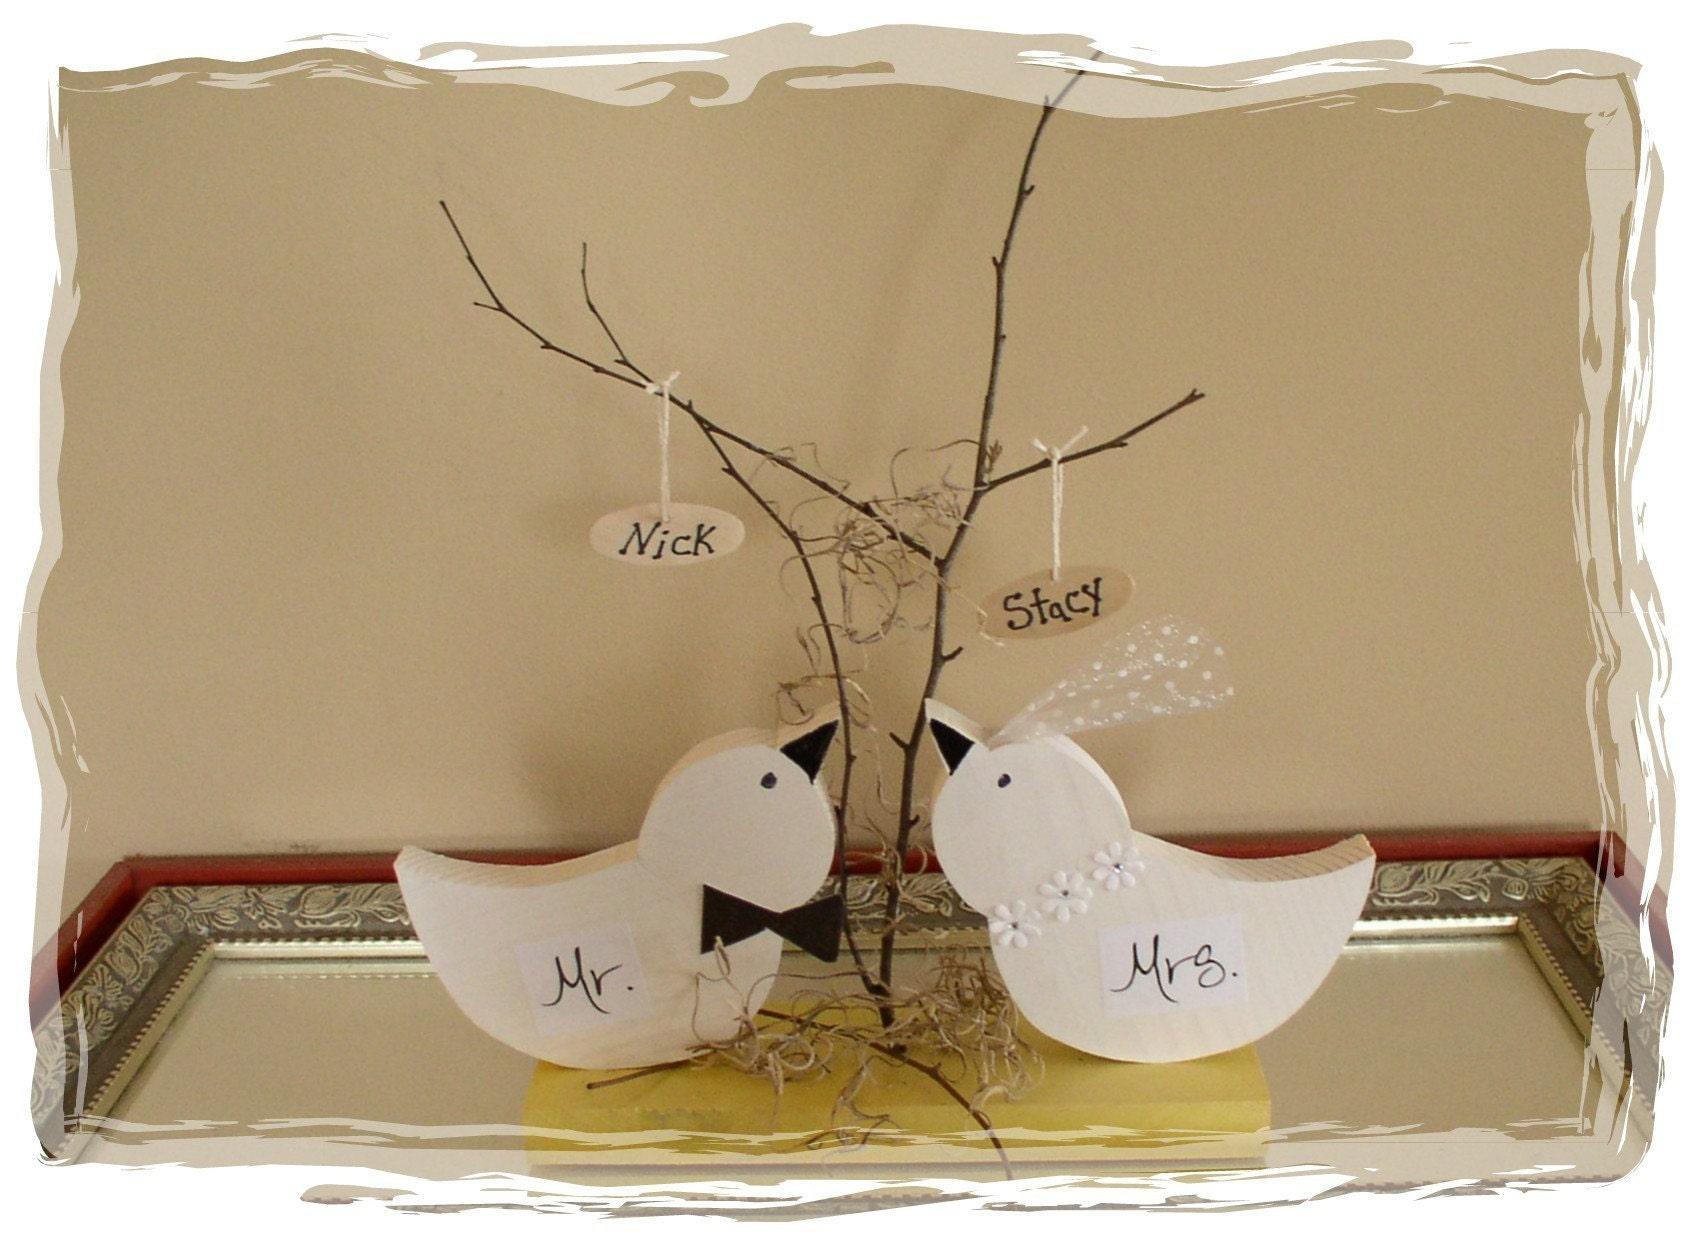 Rustic Wooden Love Birds Wedding Centerpiece Cake Topper